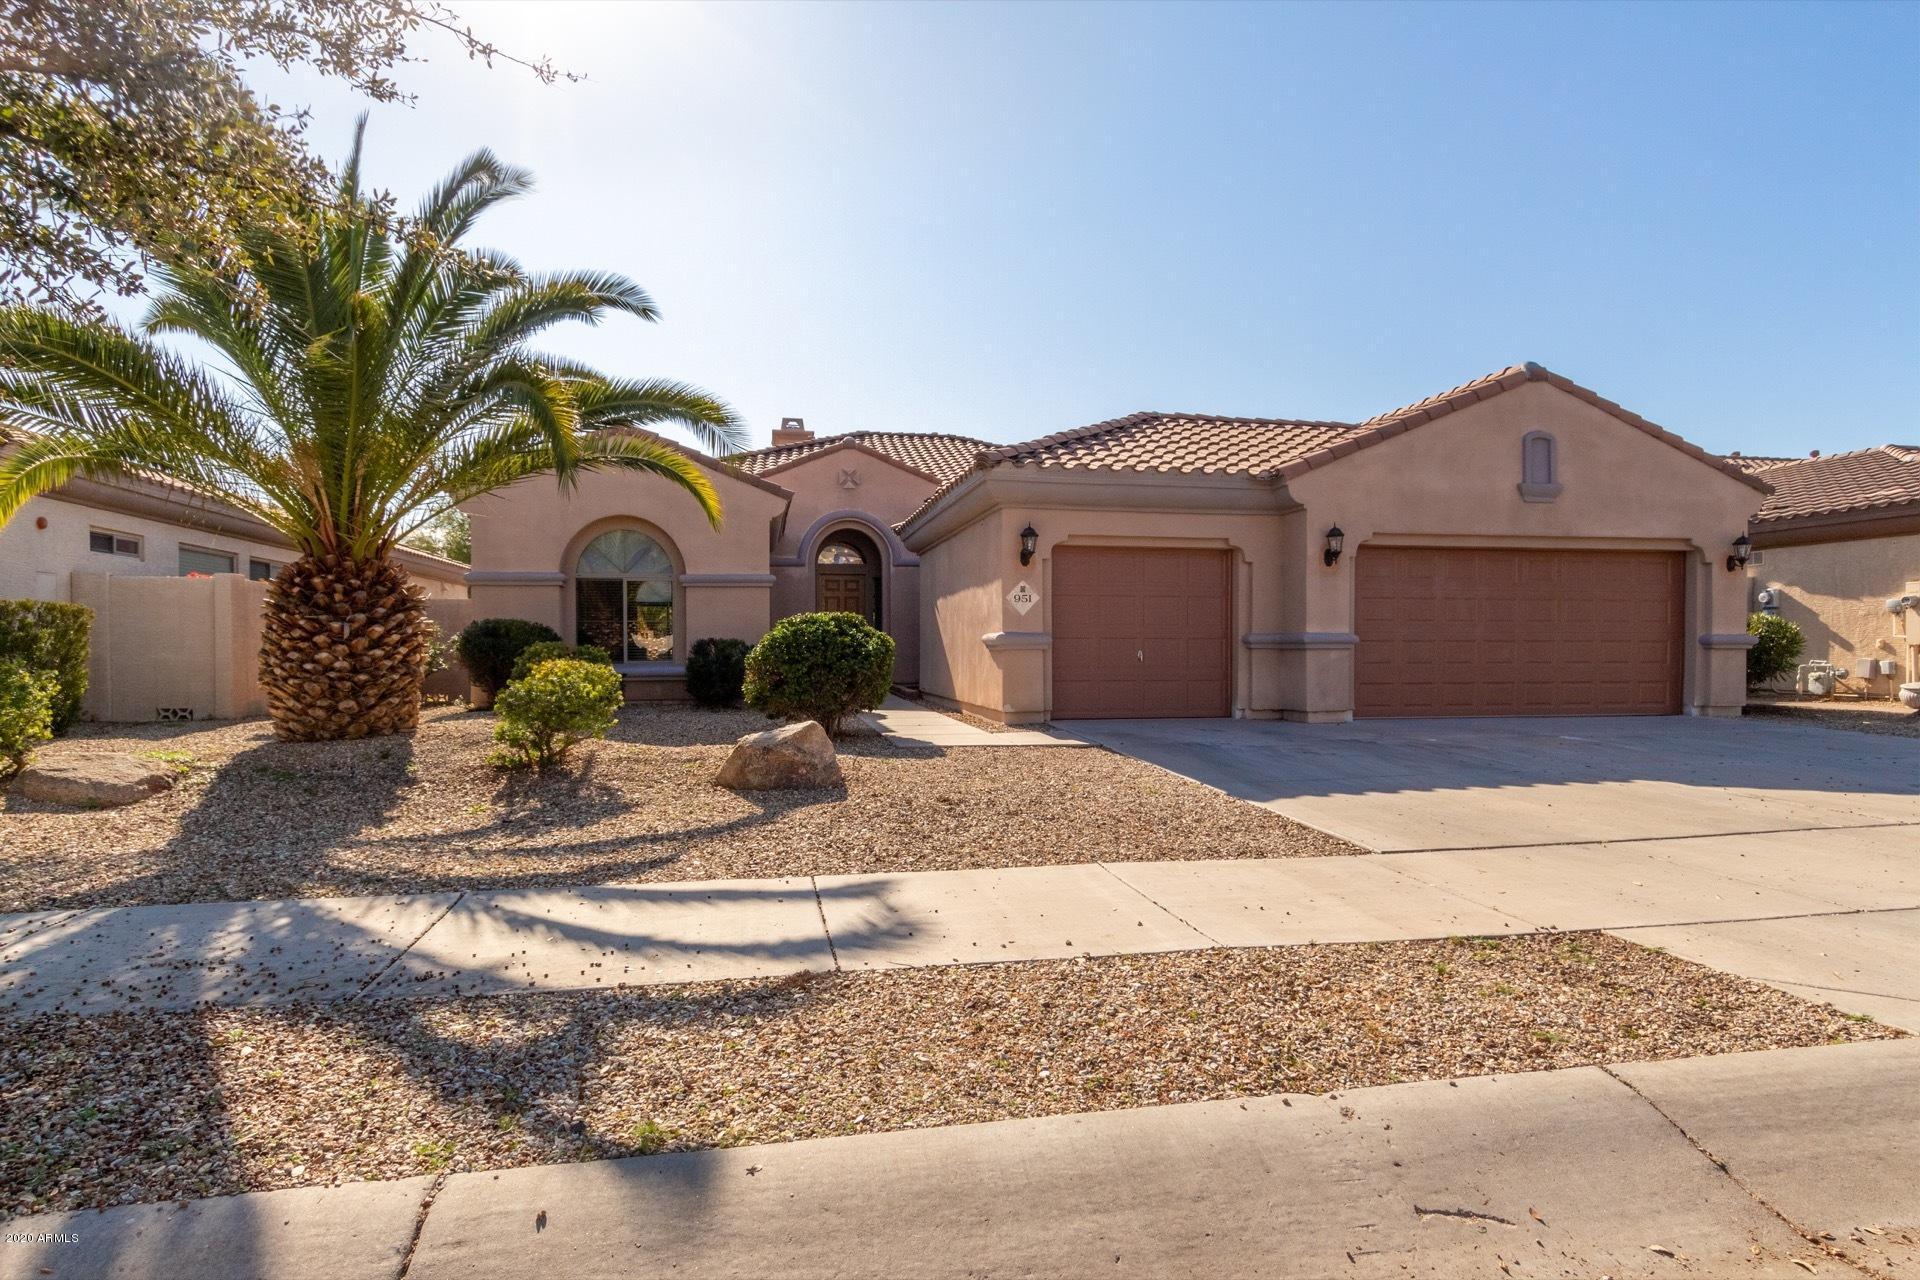 MLS 6015069 951 W ORCHARD Lane, Litchfield Park, AZ 85340